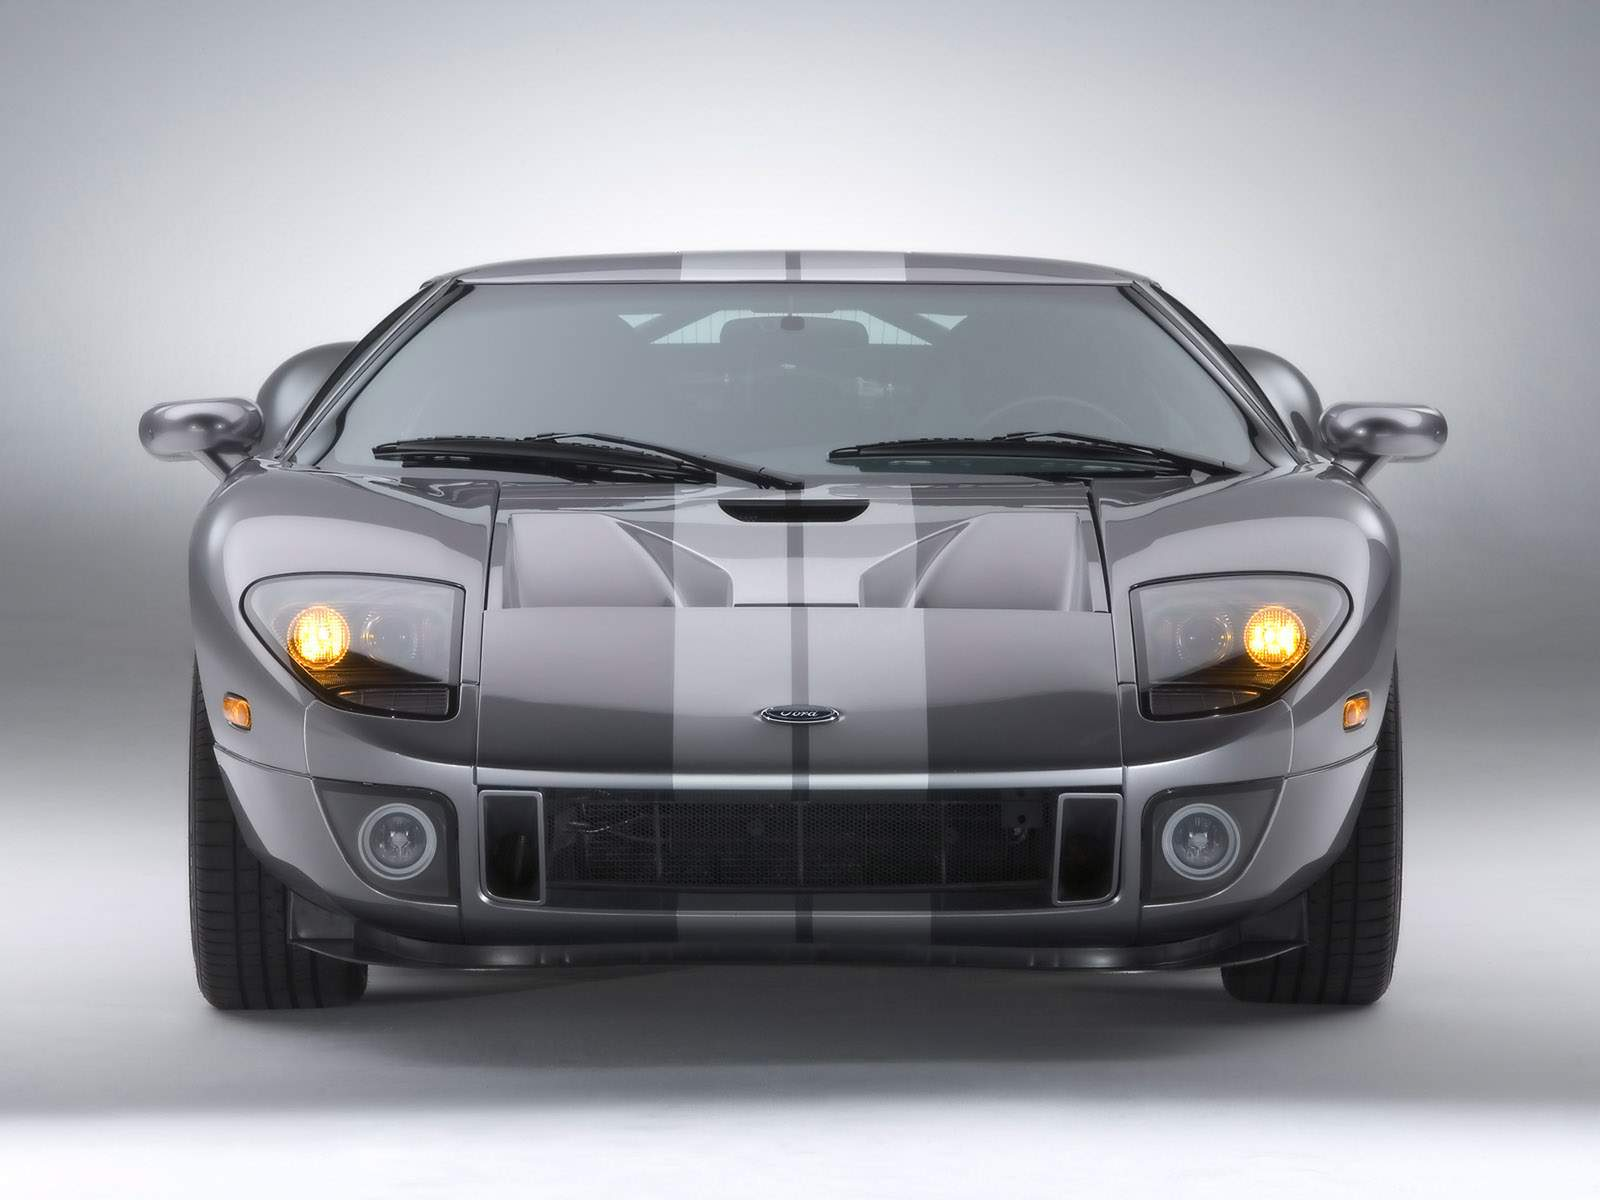 http://3.bp.blogspot.com/-k3n5_E-zDe0/ULyow6f6YxI/AAAAAAAABjc/4IM1qS5A5yM/s1600/Ford+GT+Front+View+Black+White+Wallpaper+hd.jpg